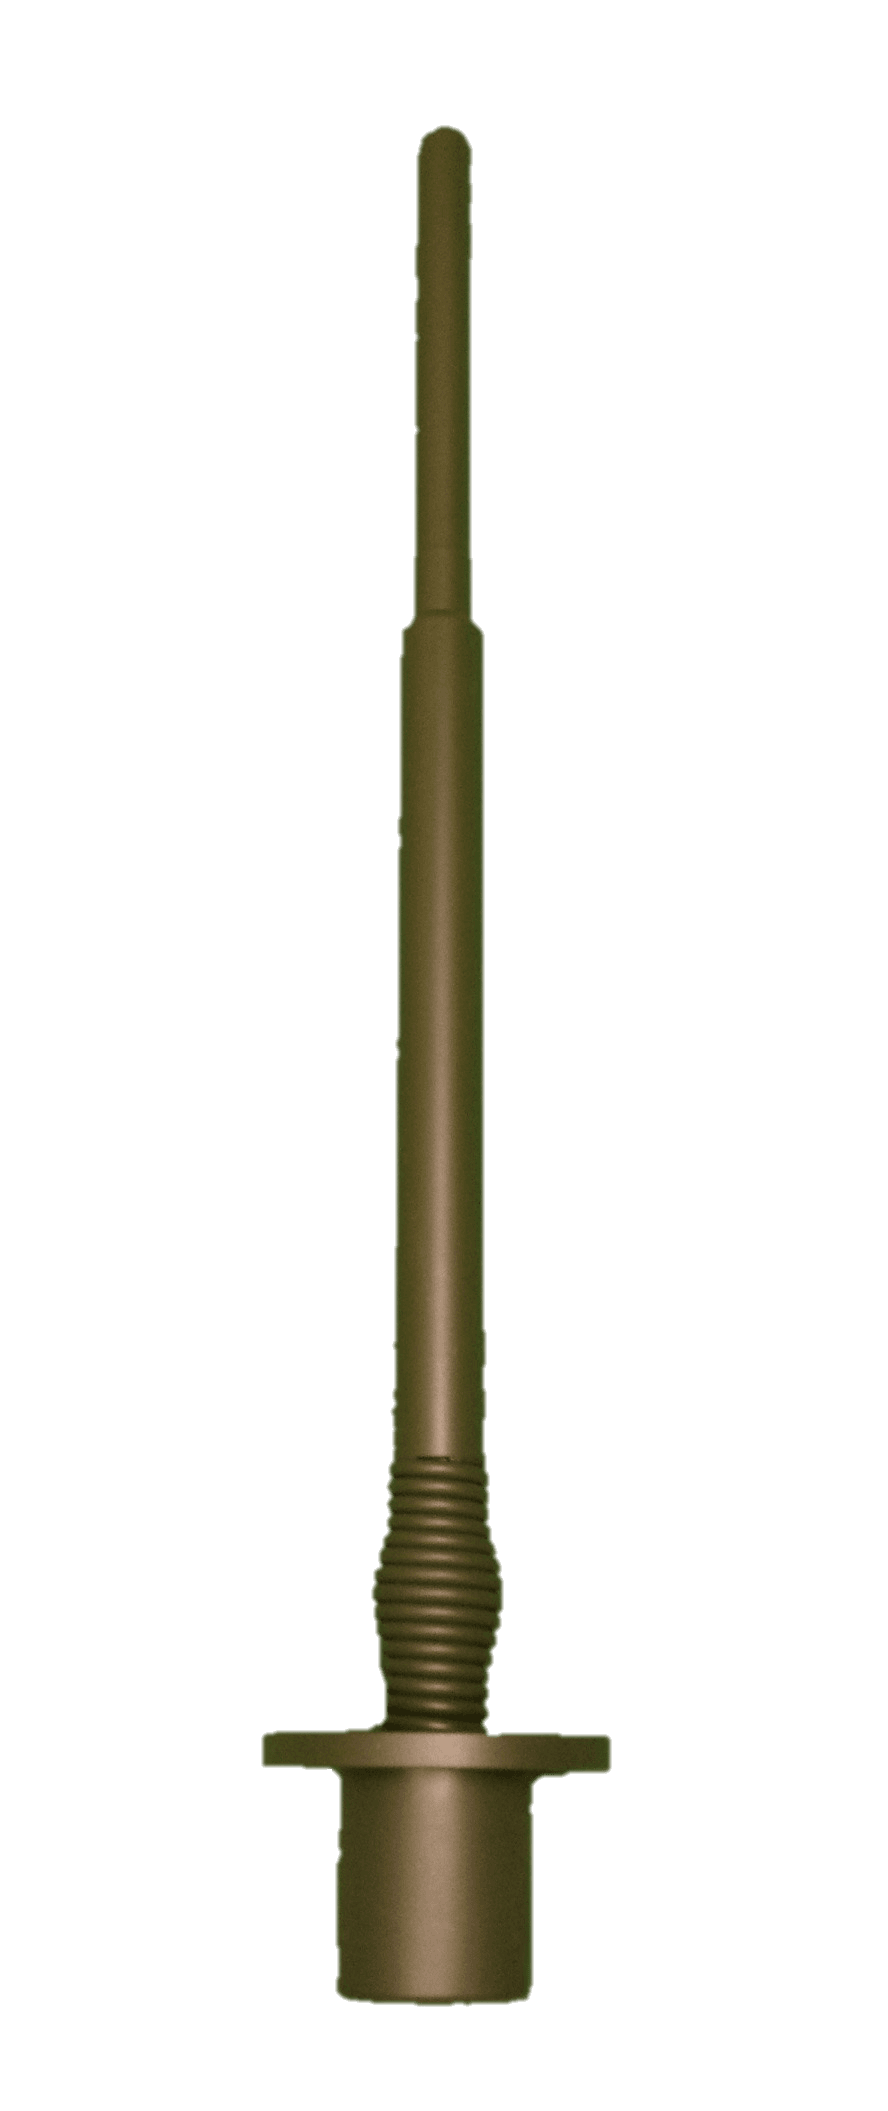 5000-6000 MHz – MVDP5.0-6.0-7-D